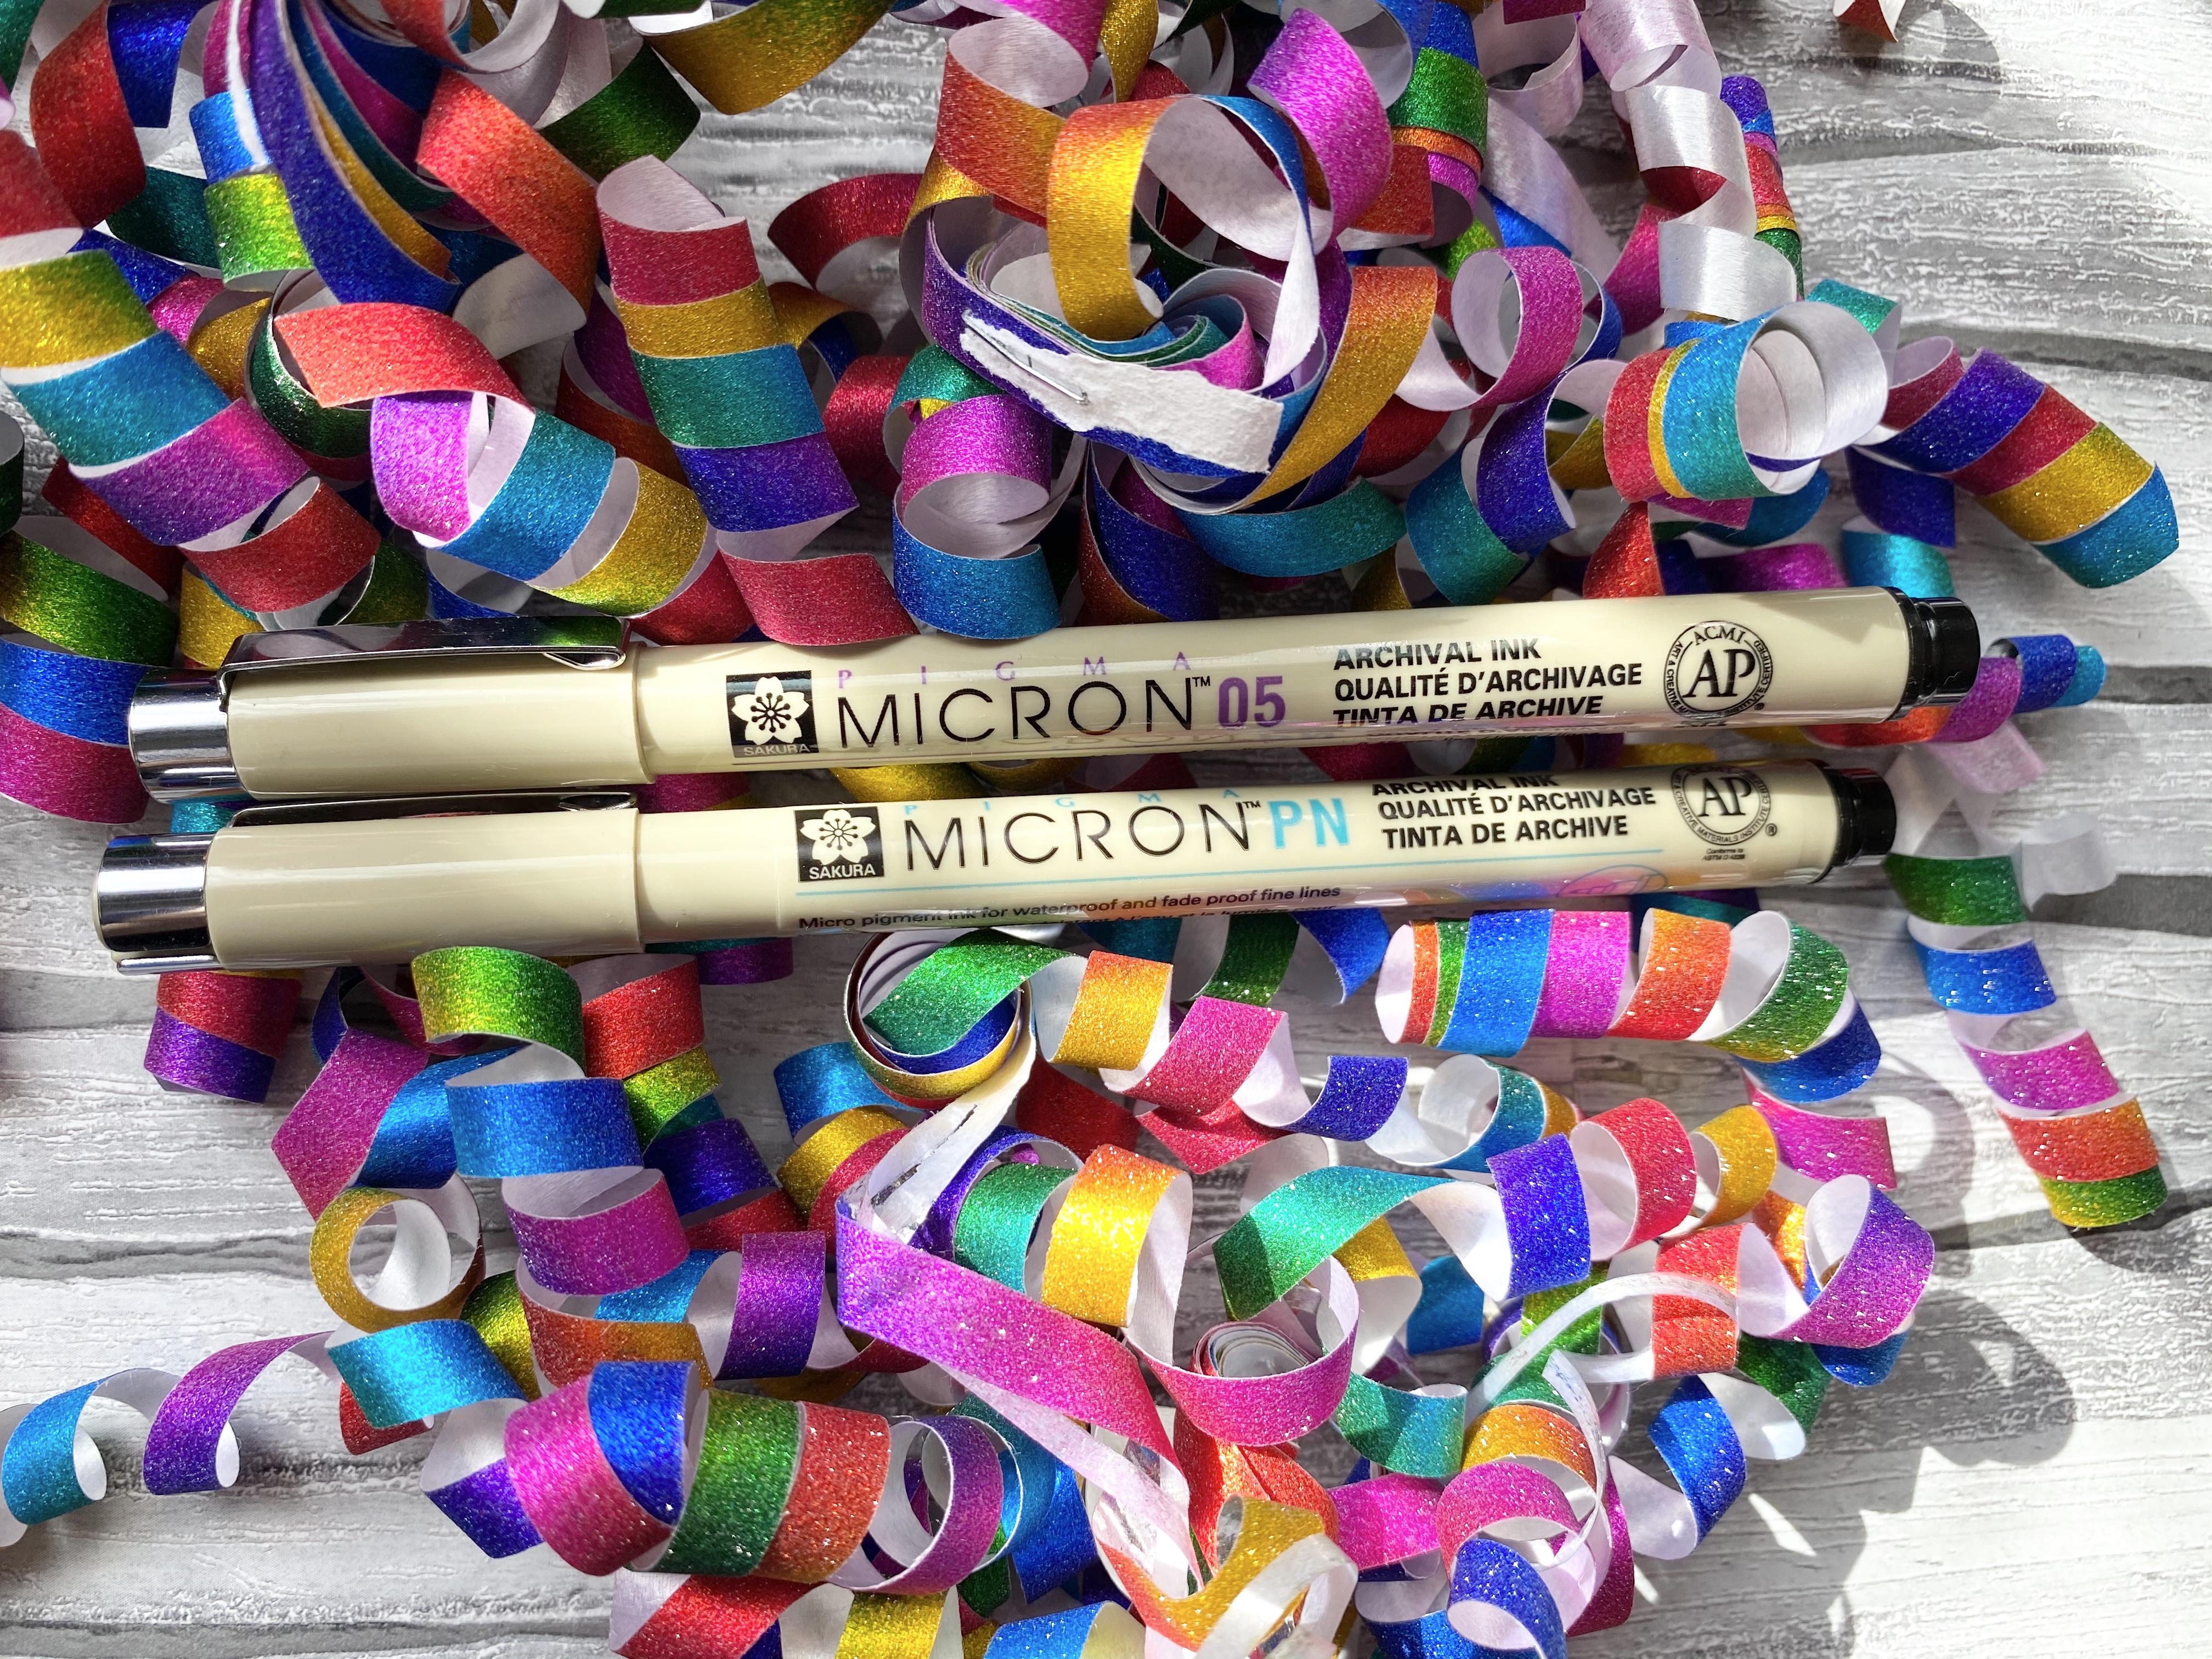 Pigma Micron Pens PN and O5mm on colourful confetti